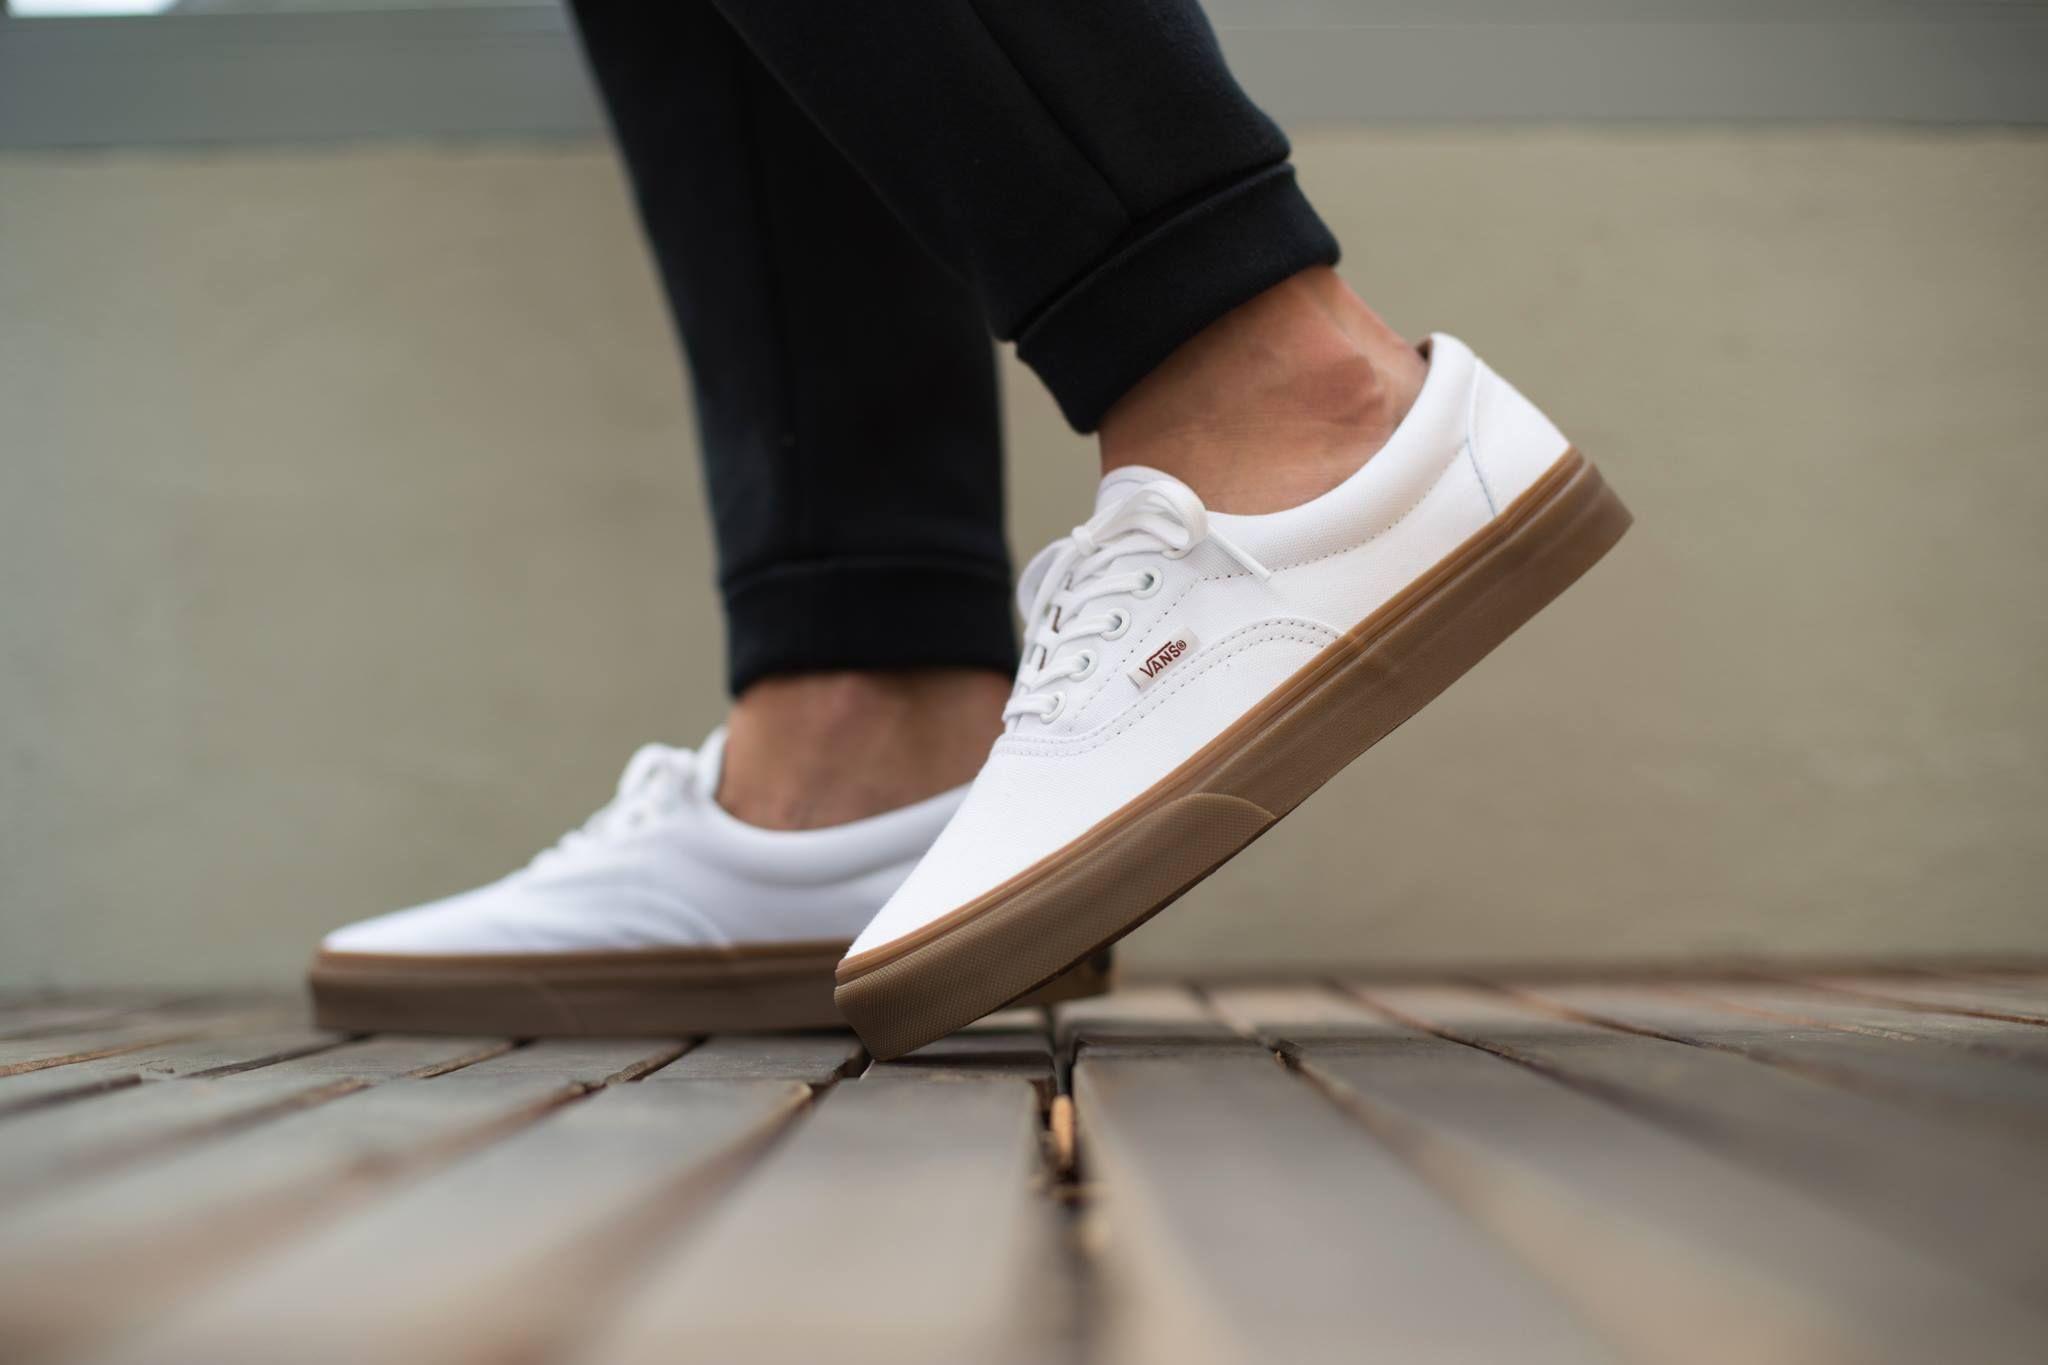 Vans Era | Chaussures pour hommes, Chaussure mode, Chaussure ...